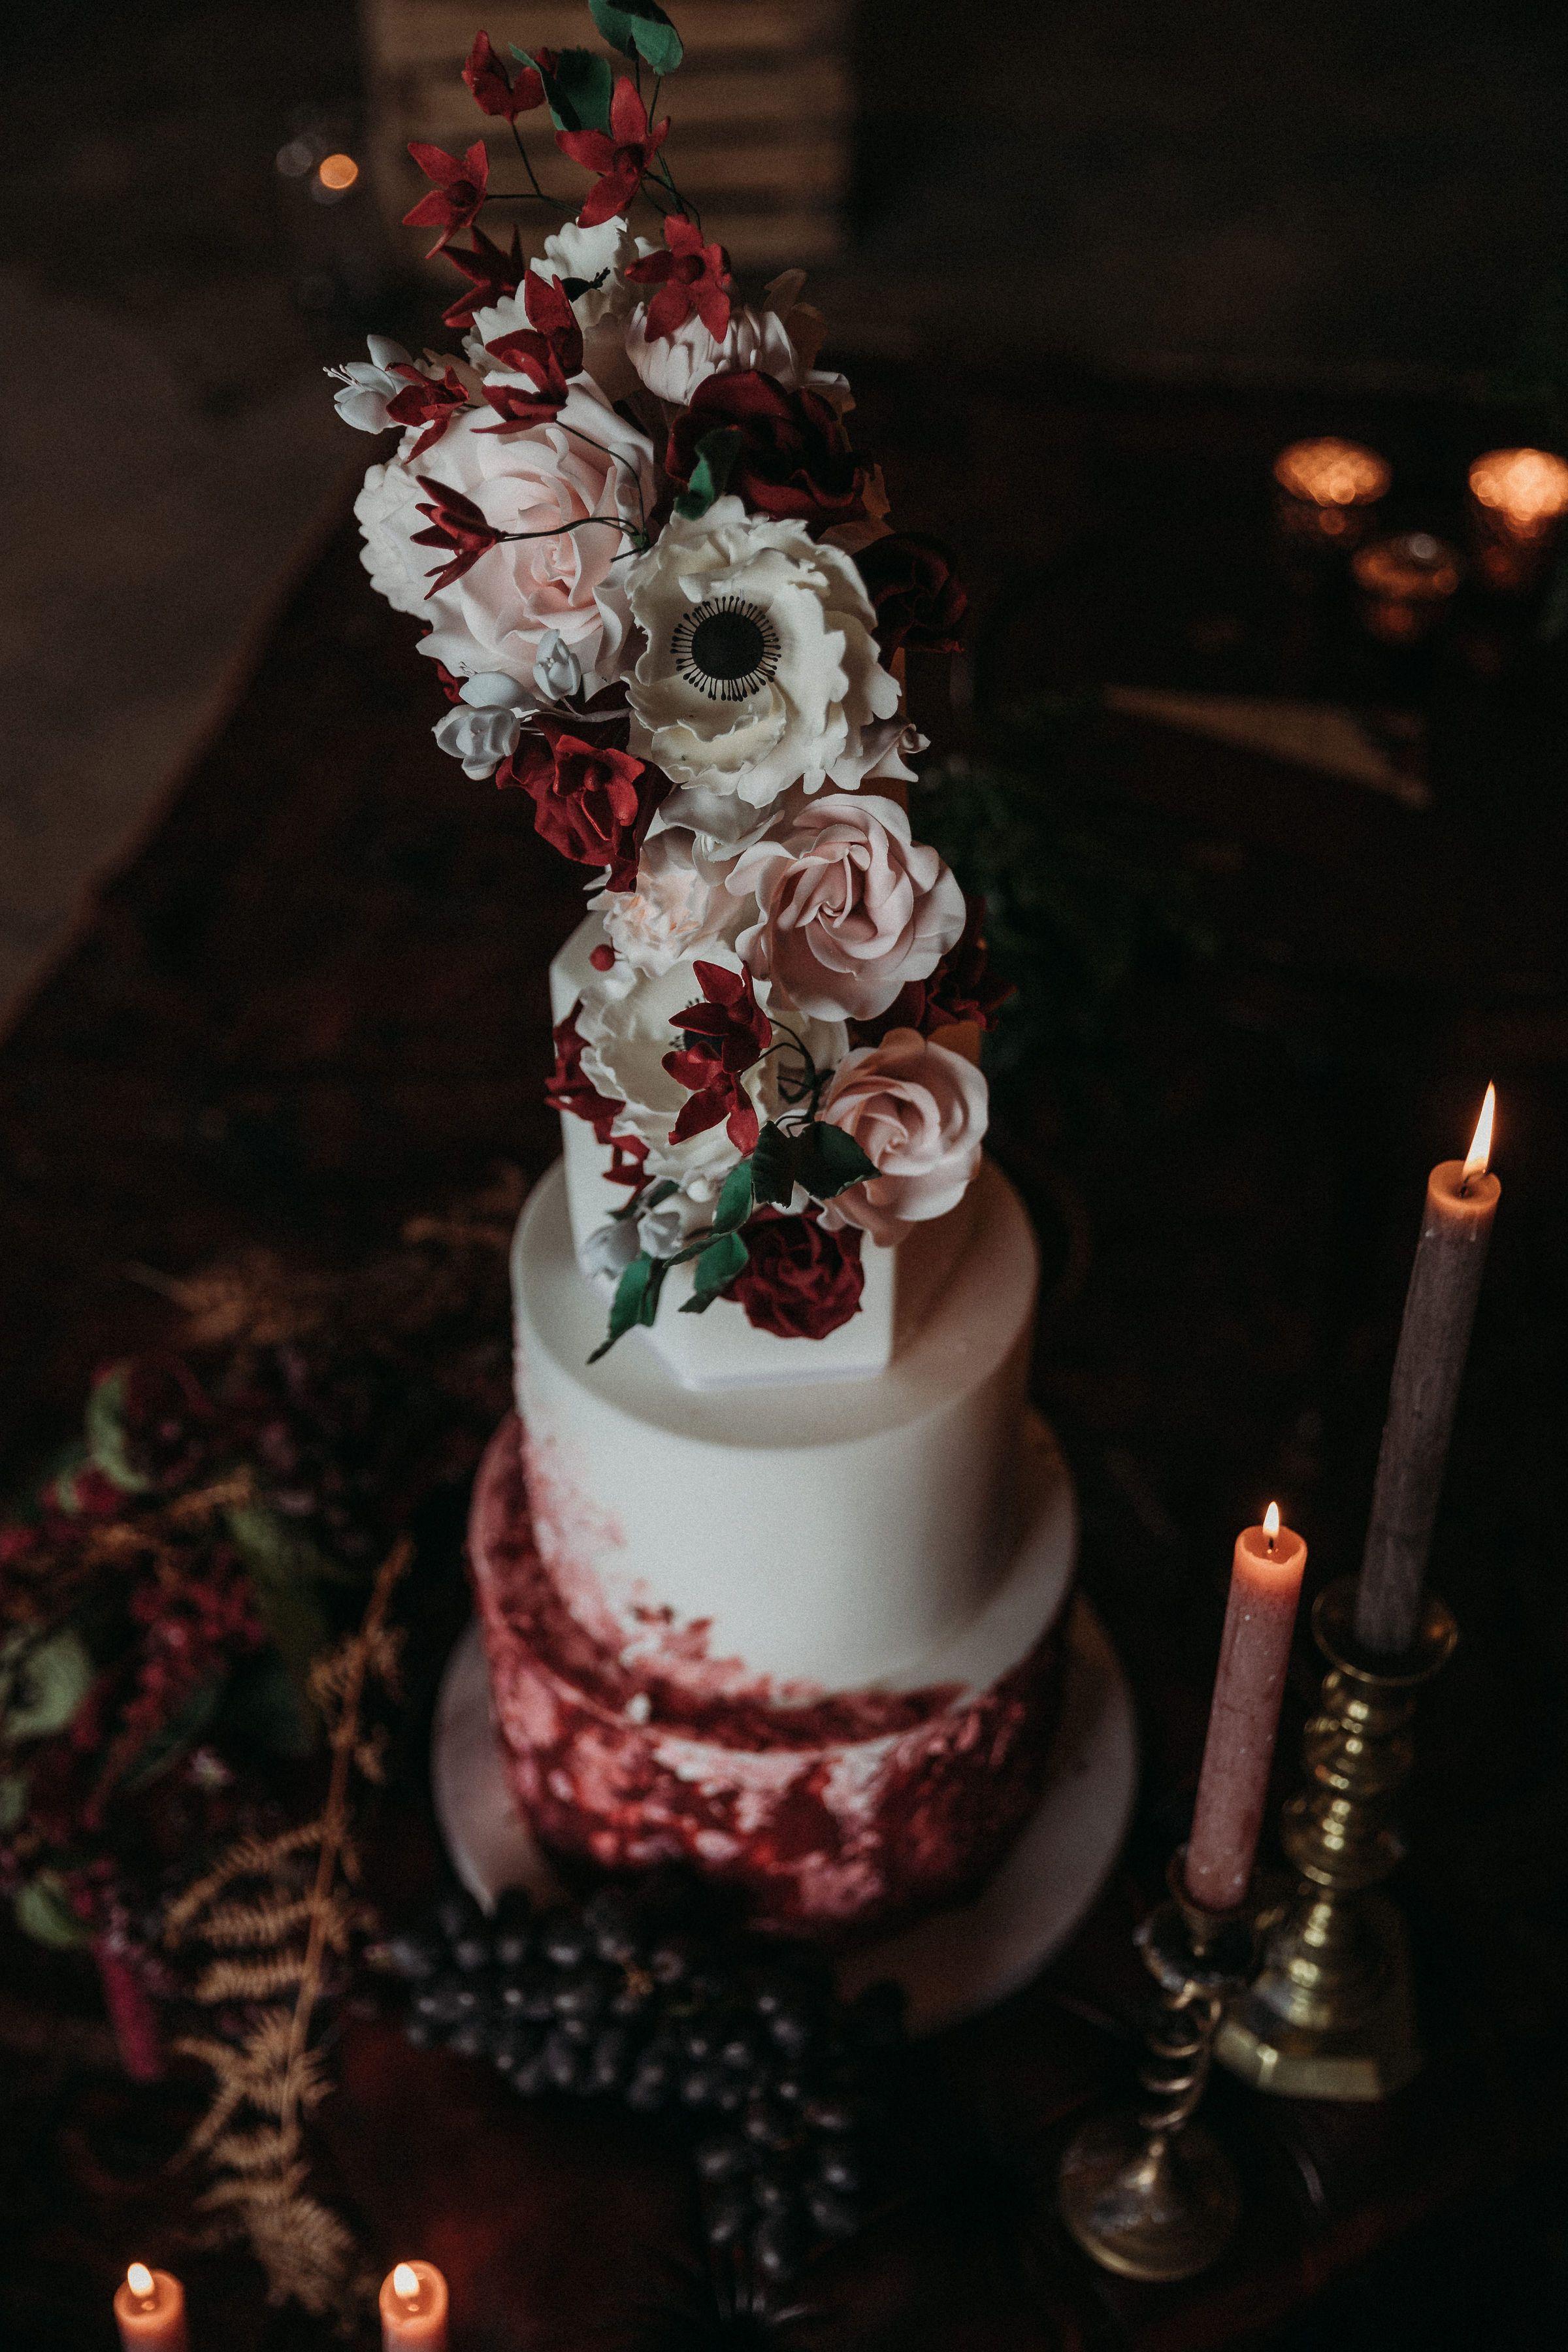 Painted watercolour buttercream palette knife wedding cake